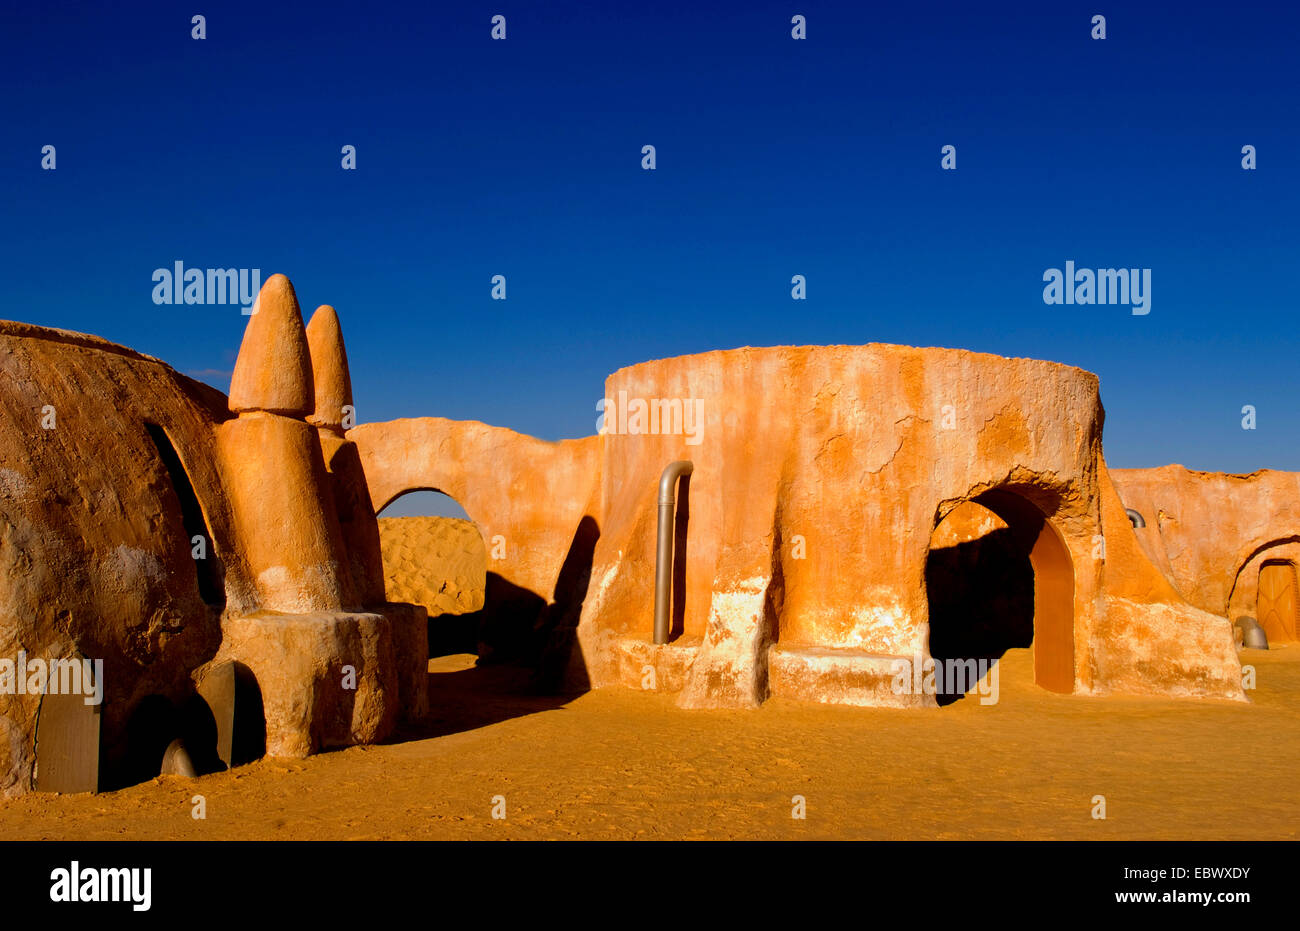 Famous movie set of Star Wars movies in Sahara Desert near Tozeur, Tunisia - Stock Image